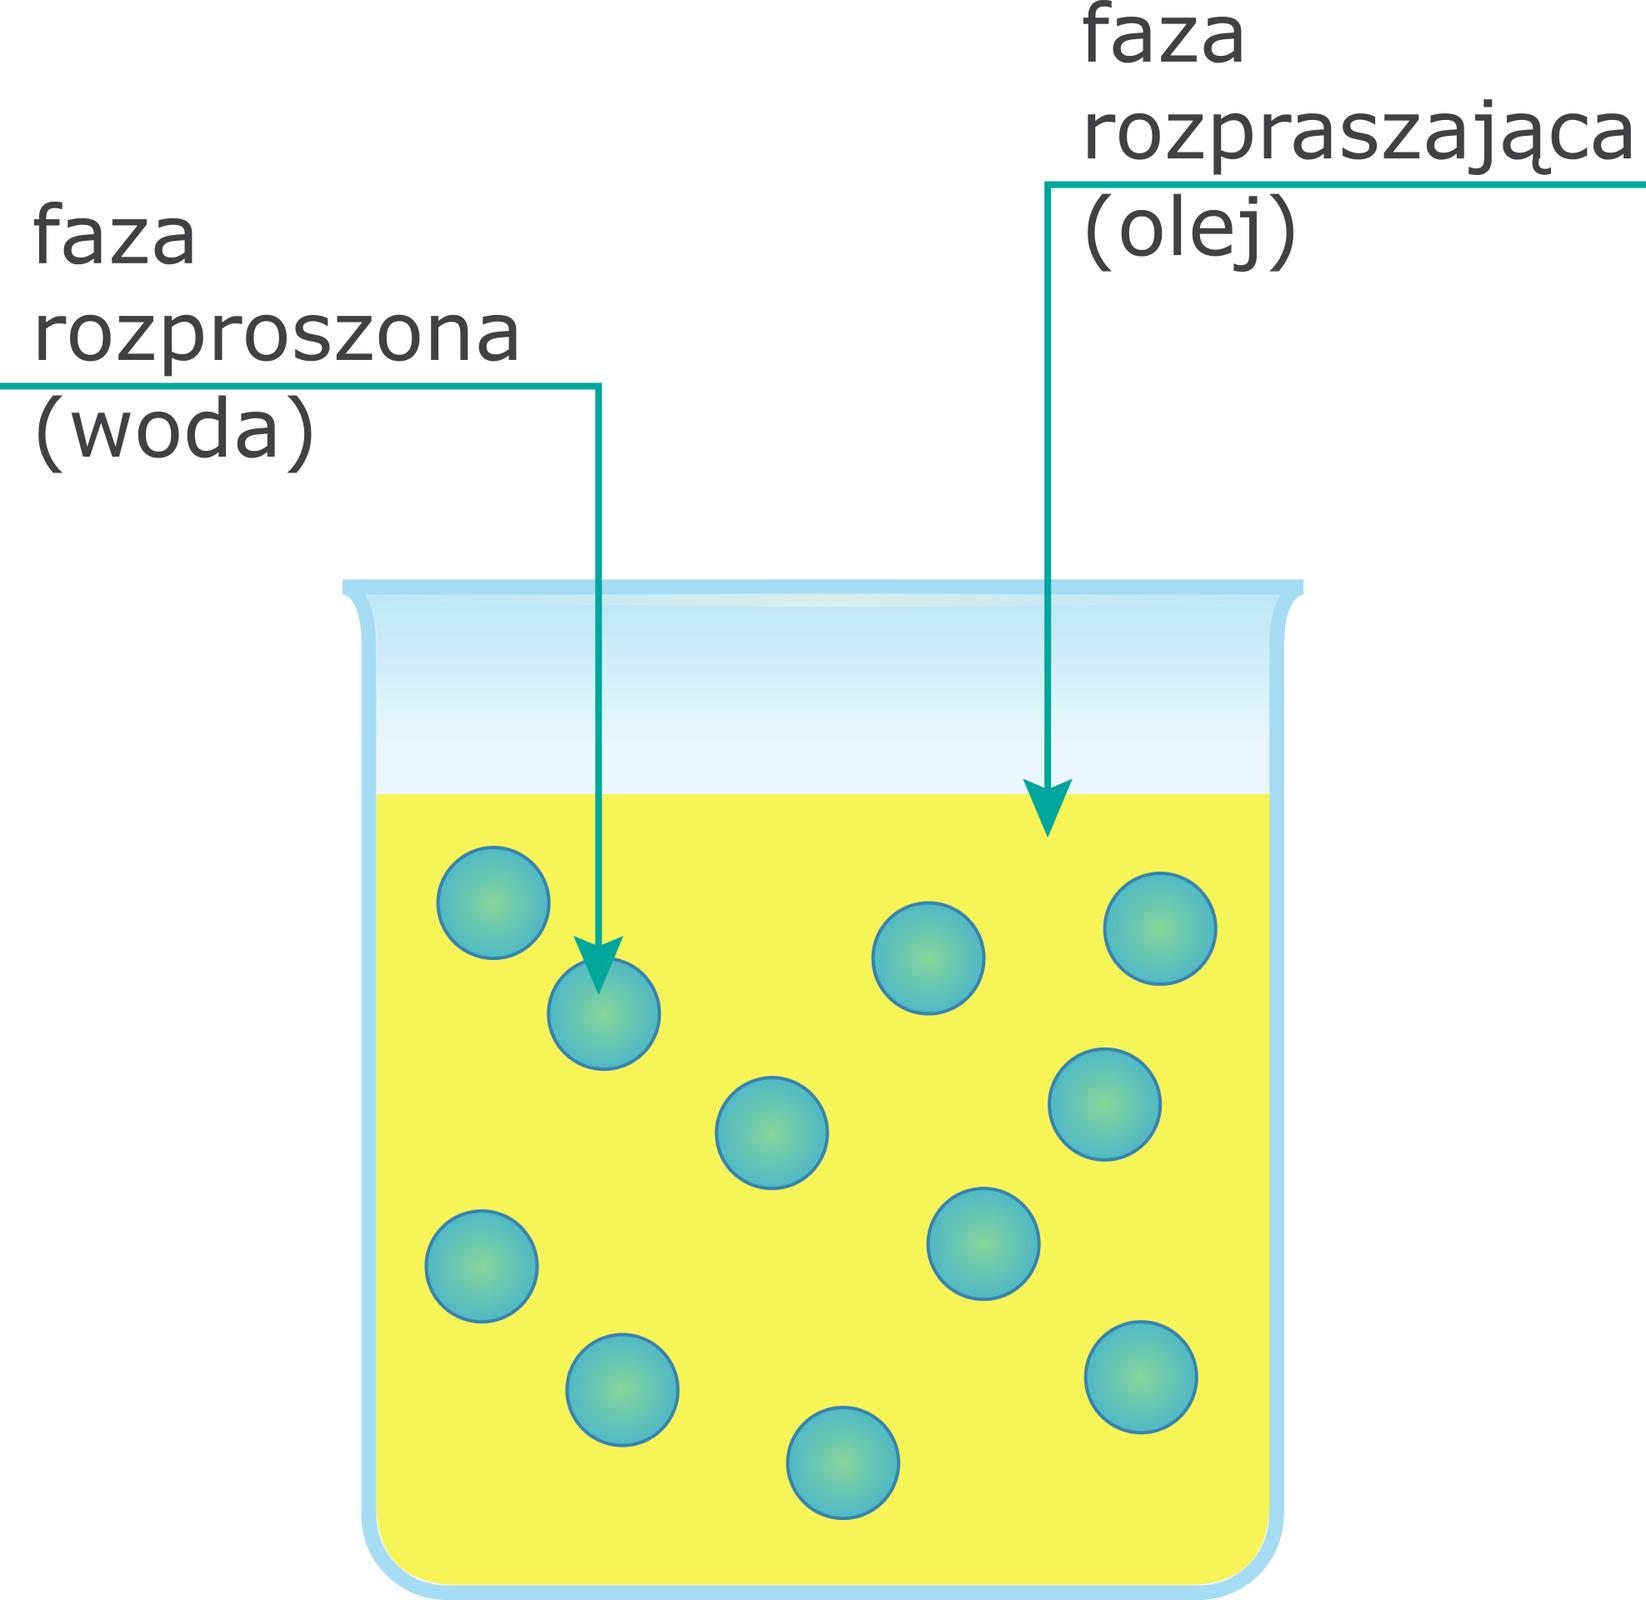 Emulsja typu woda woleju w/o